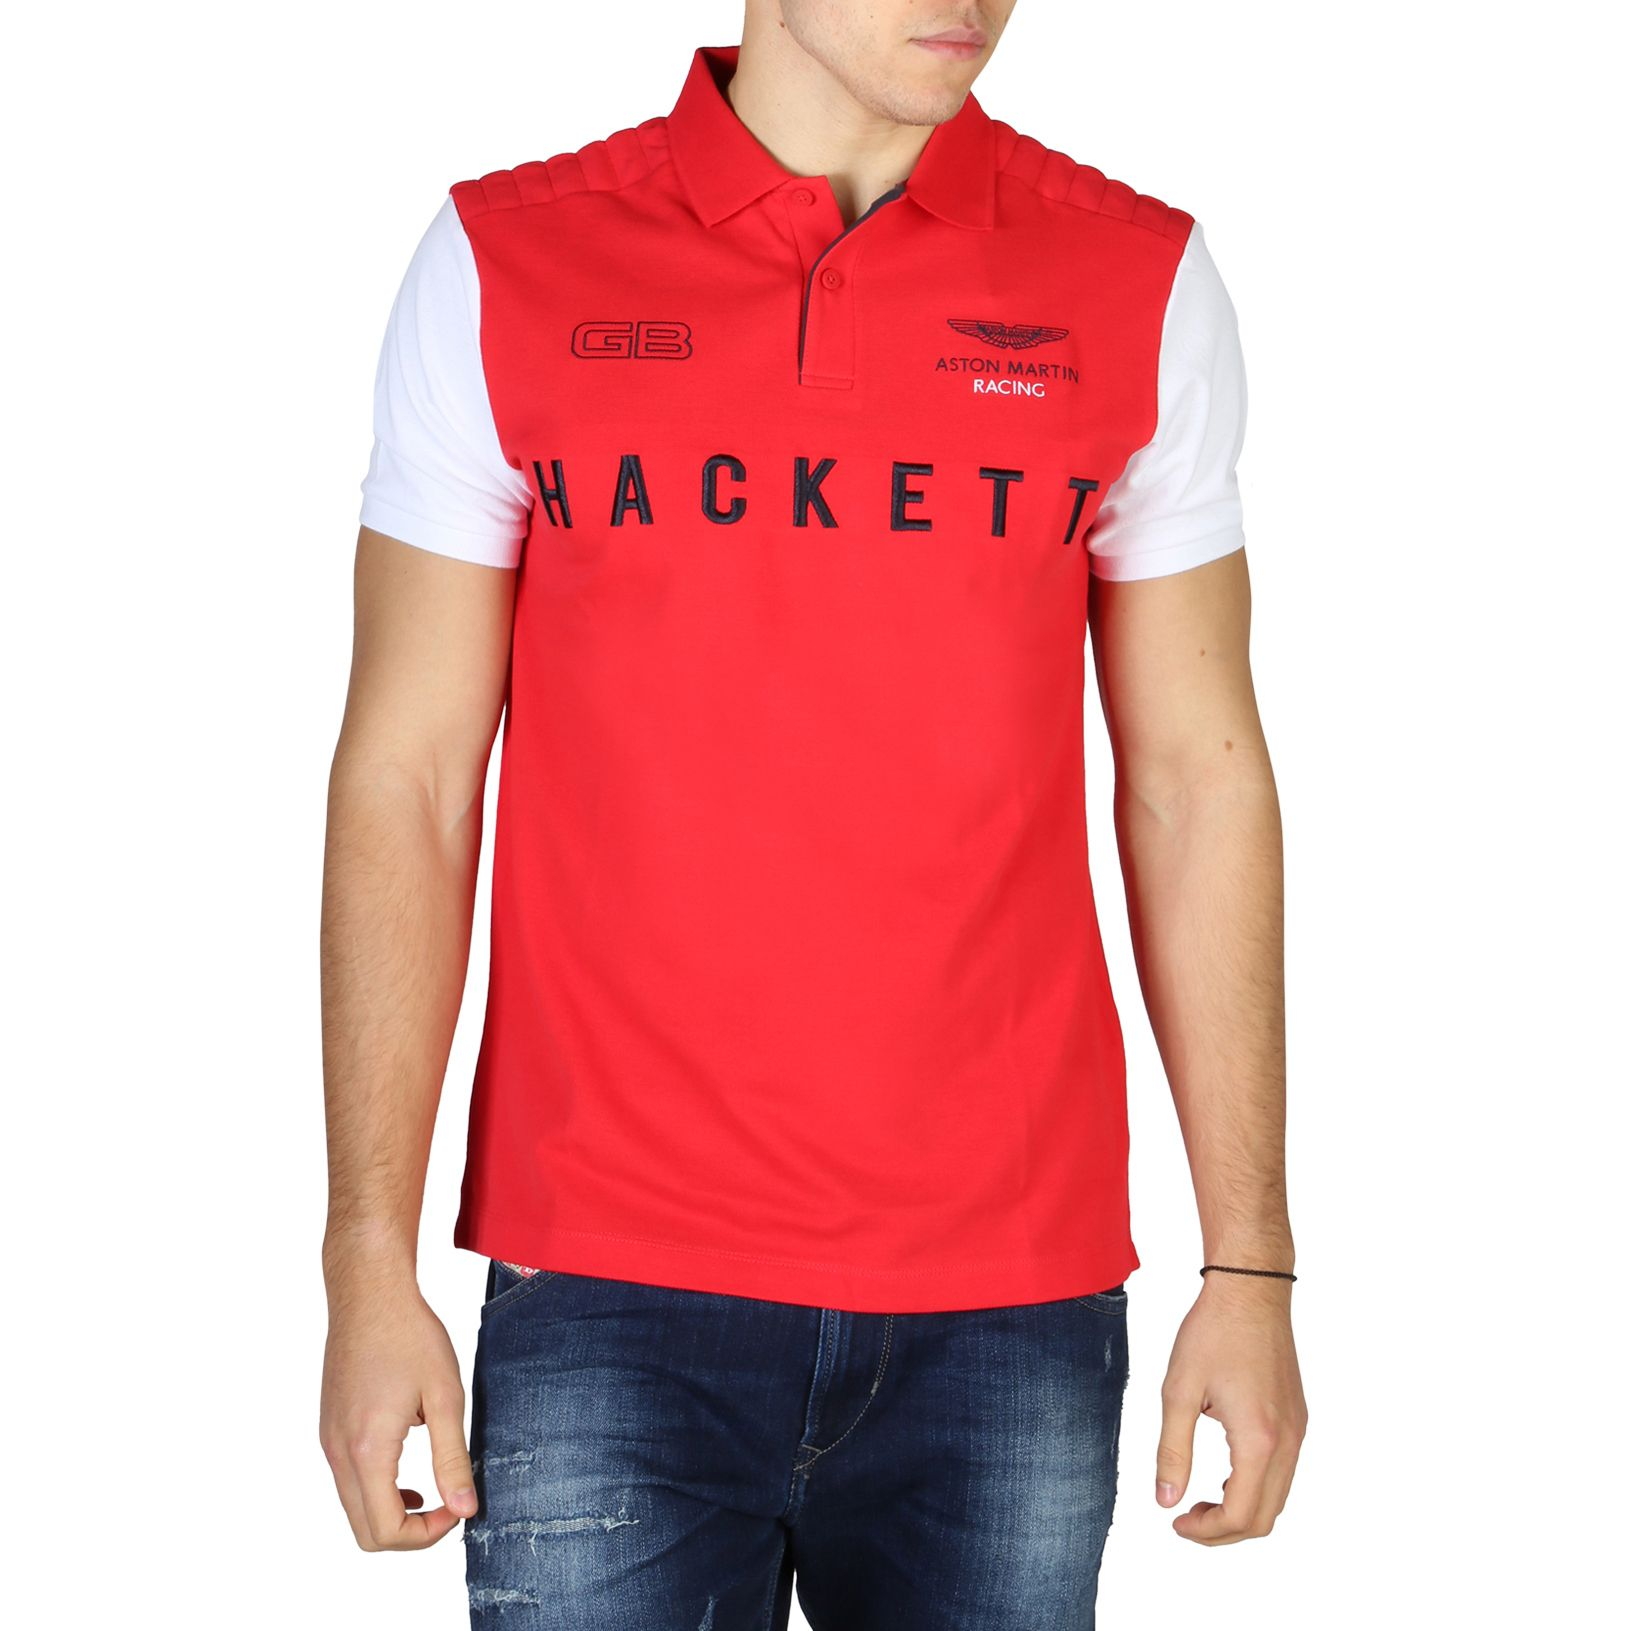 Hackett – HM562678 – Rouge